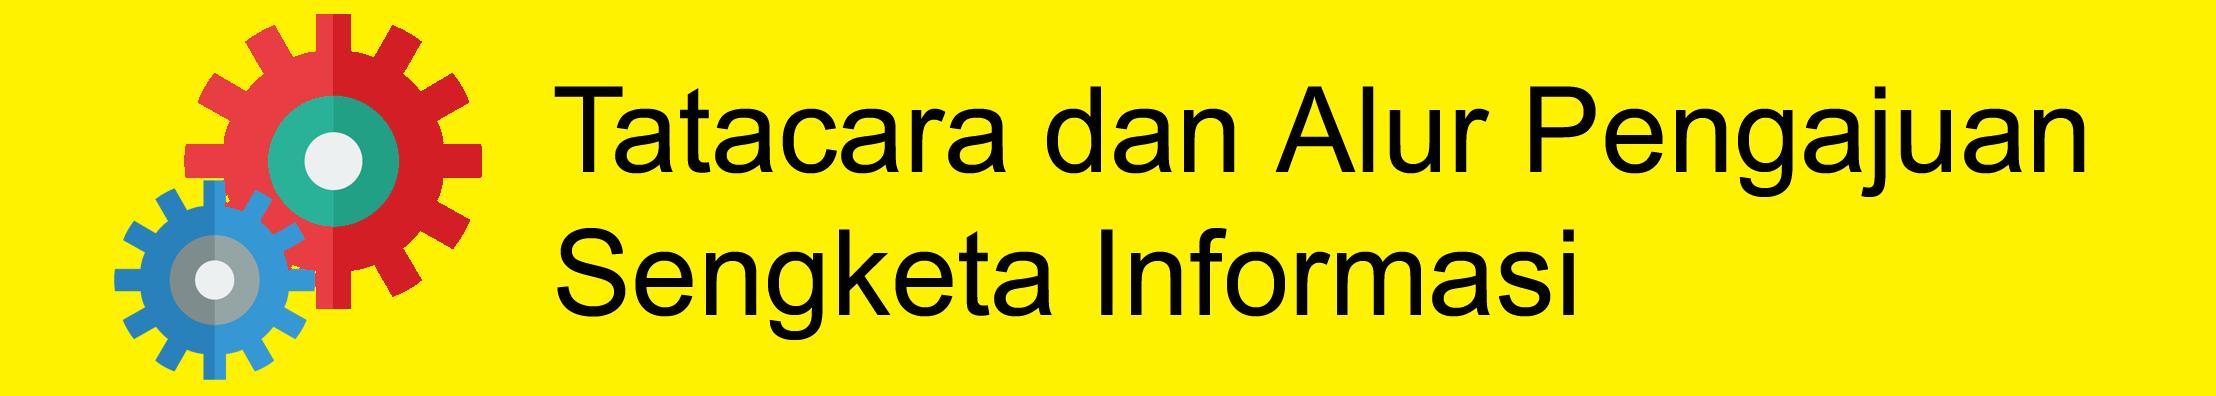 Tata Cara Pengajuan Permohonan Penyelesaian Sengketa ke Komisi Informasi